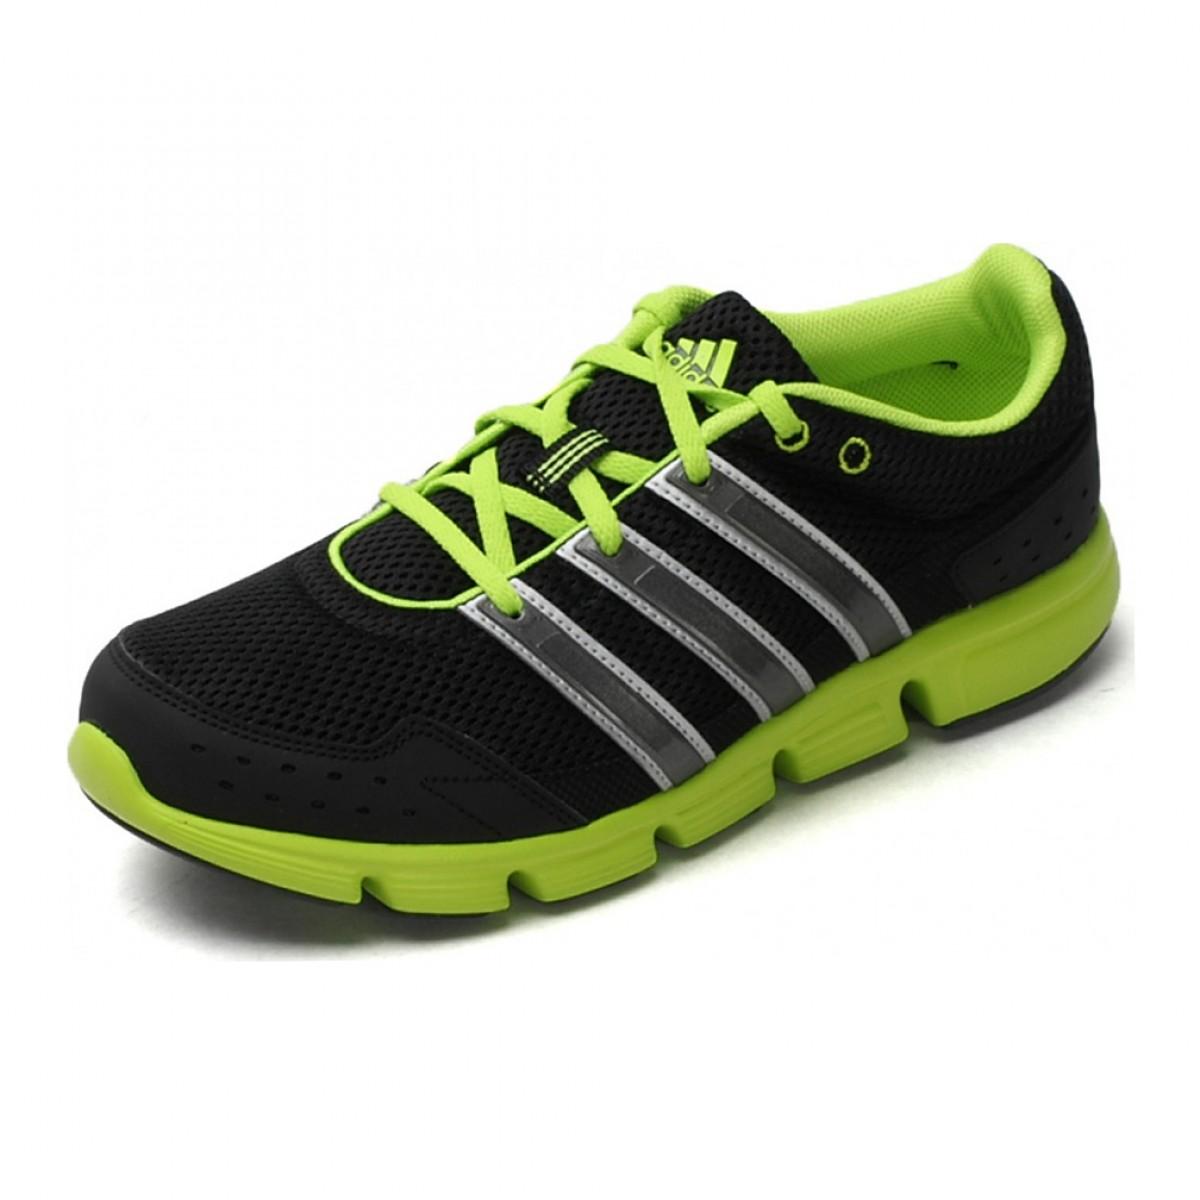 10733a0f878 Tênis Adidas Breeze 101 Masculino - Preto e Verde ...